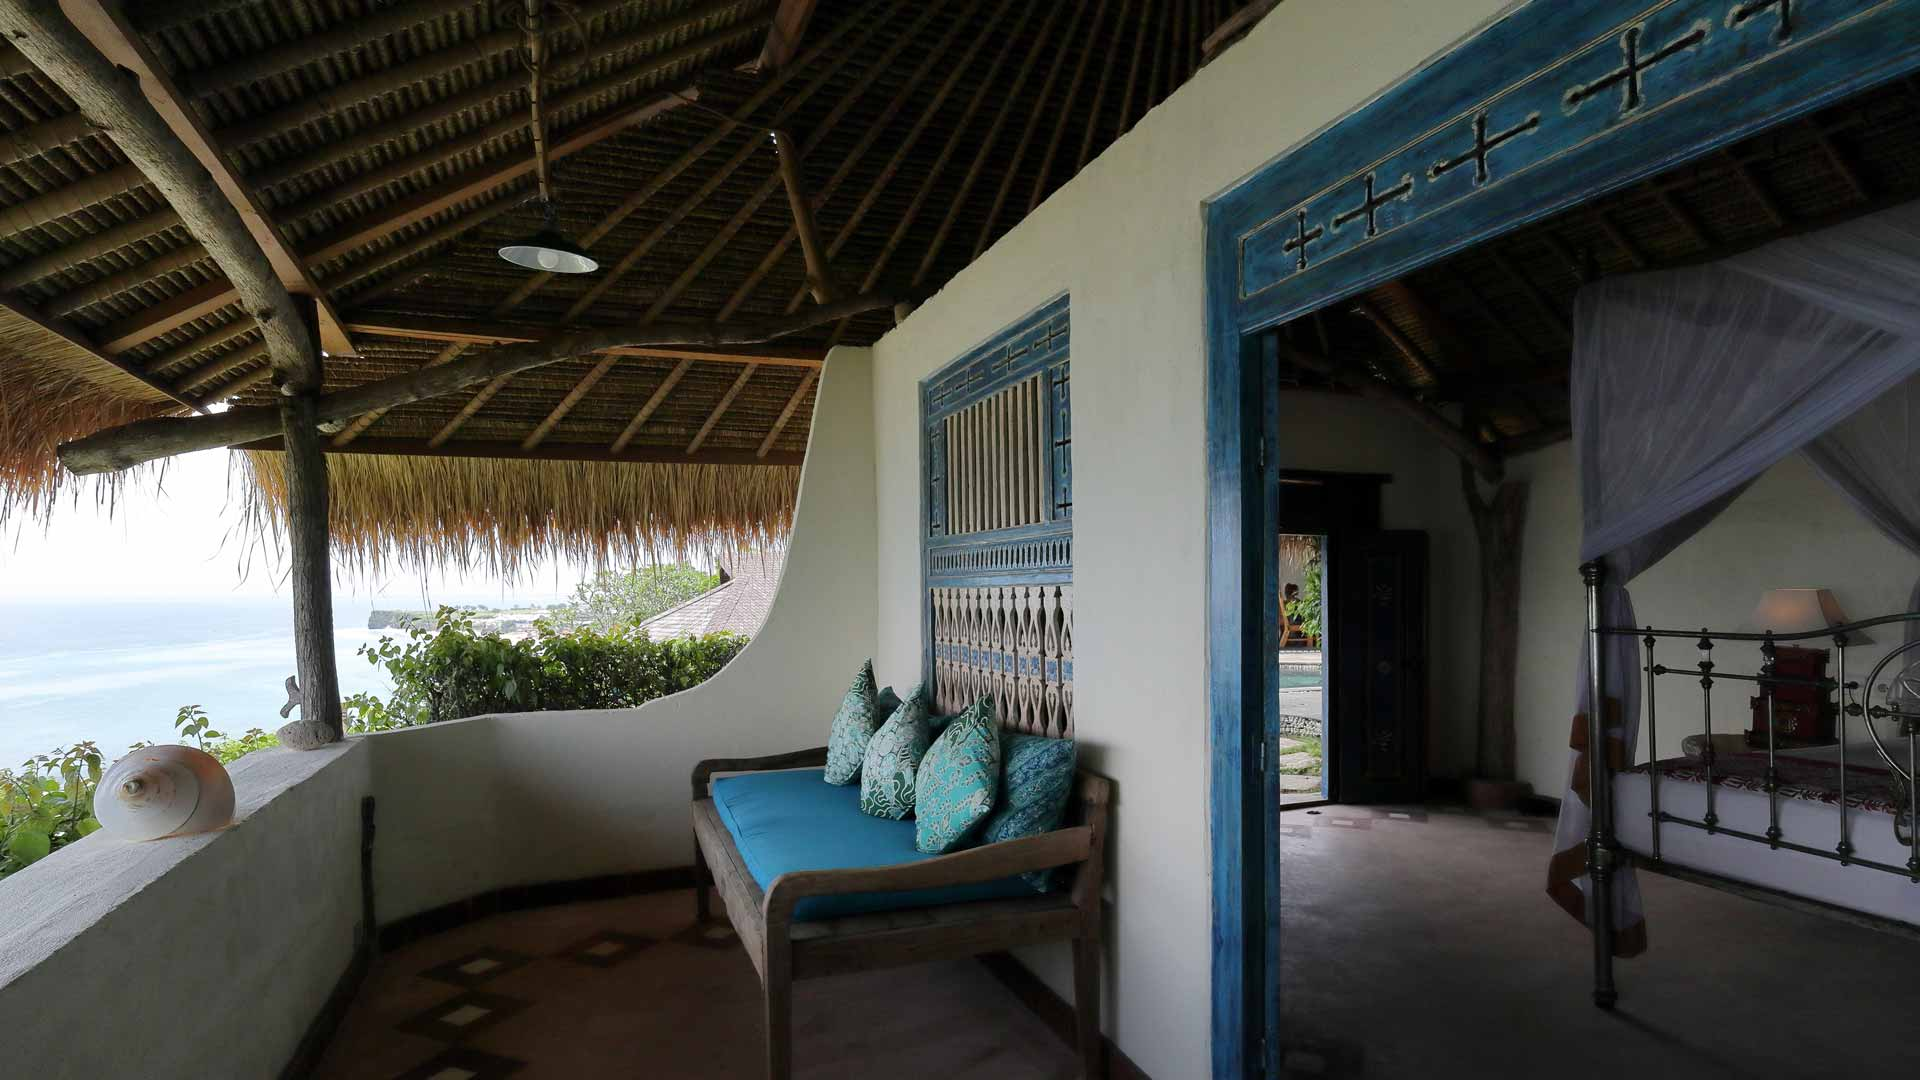 The Samudra Suite 11